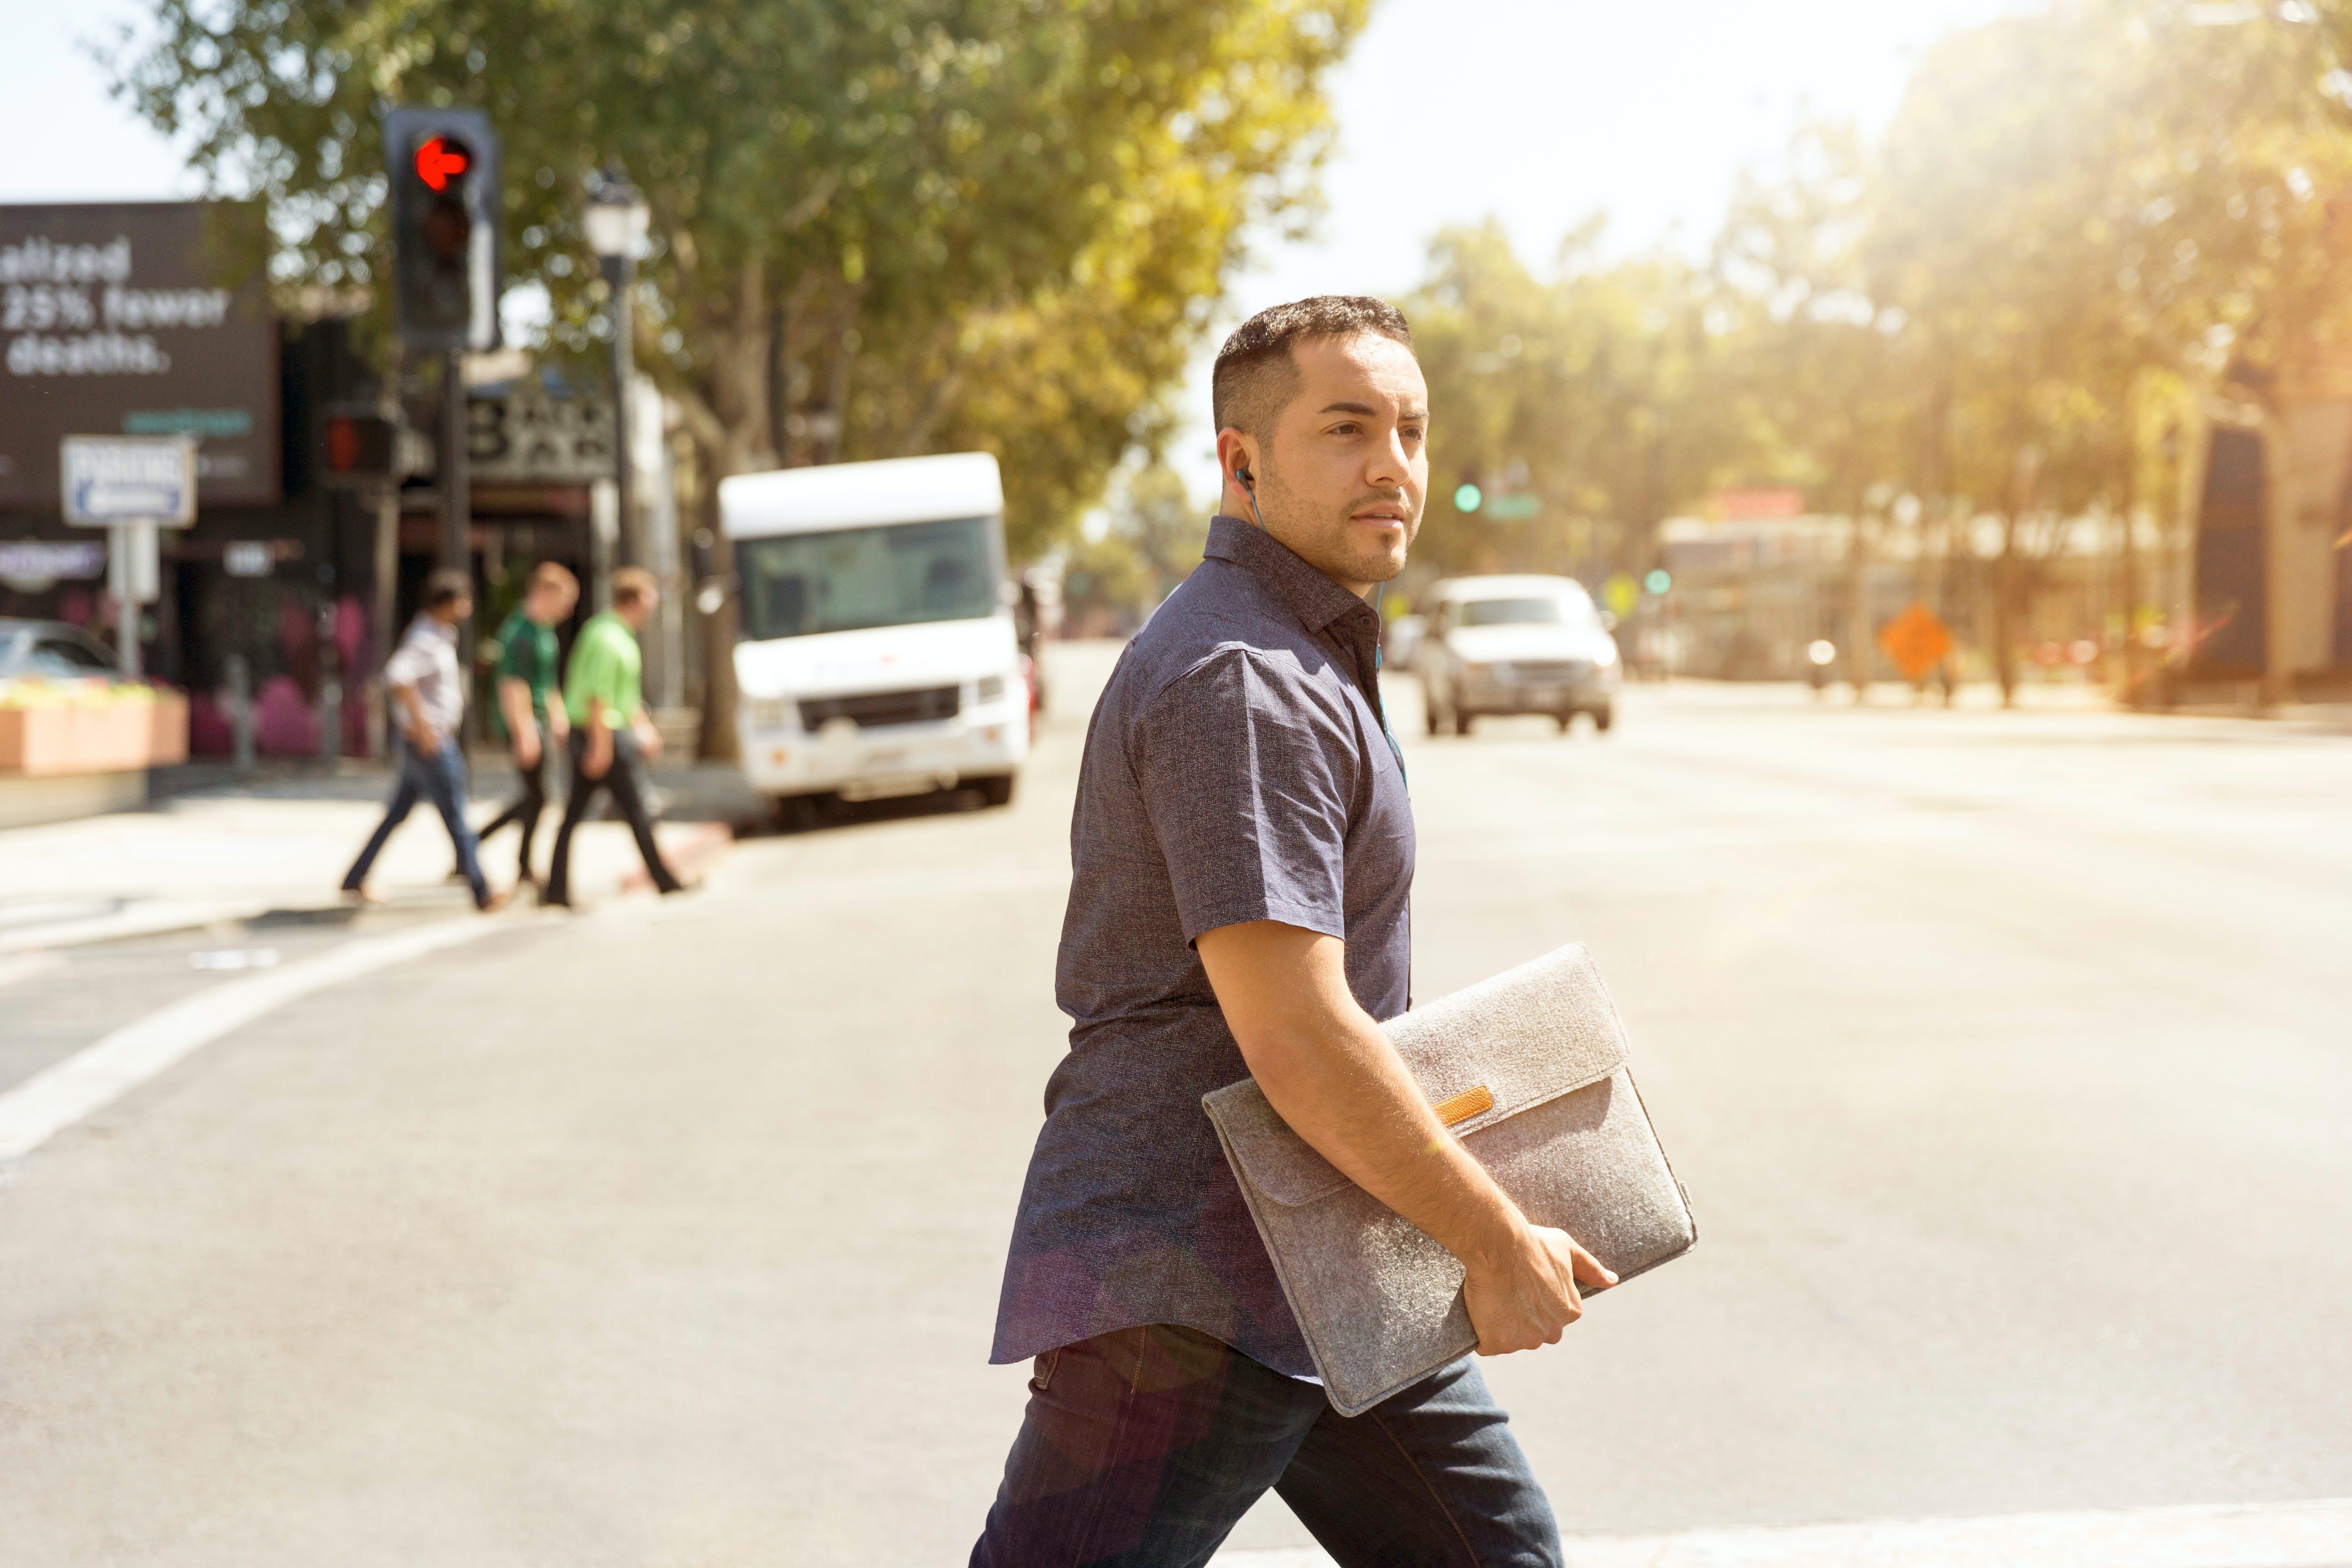 Man Holding Folder Crossing the Road